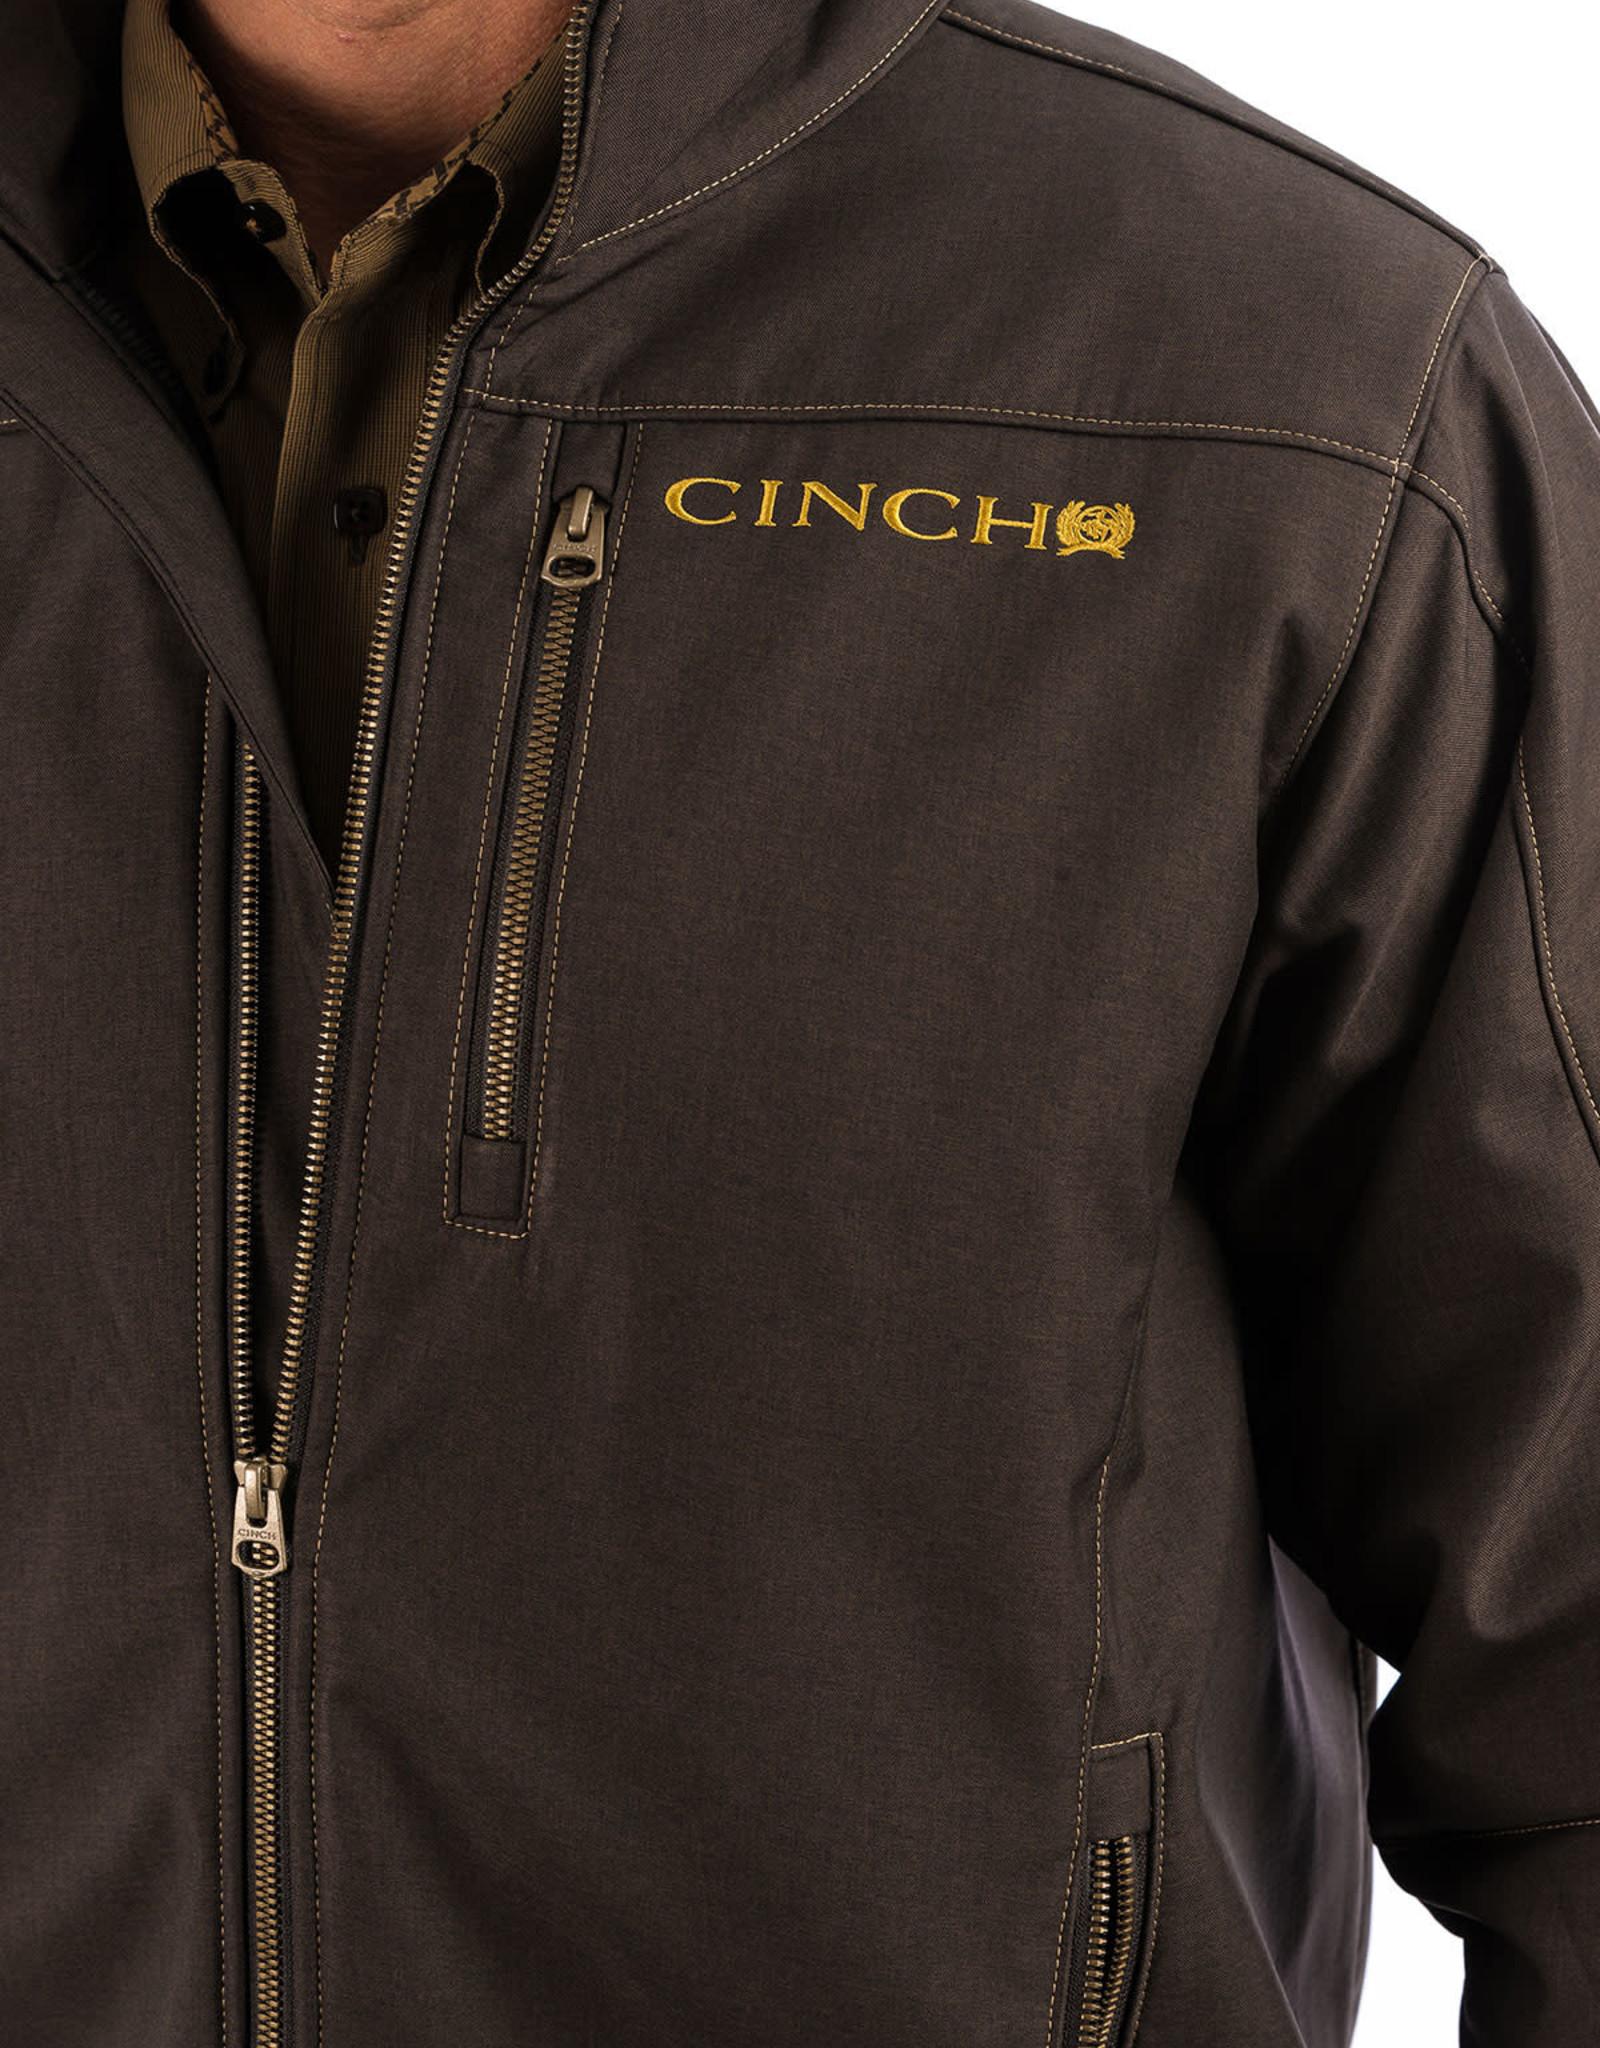 Cinch Mens Cinch Bonded Brown Barn Jacket